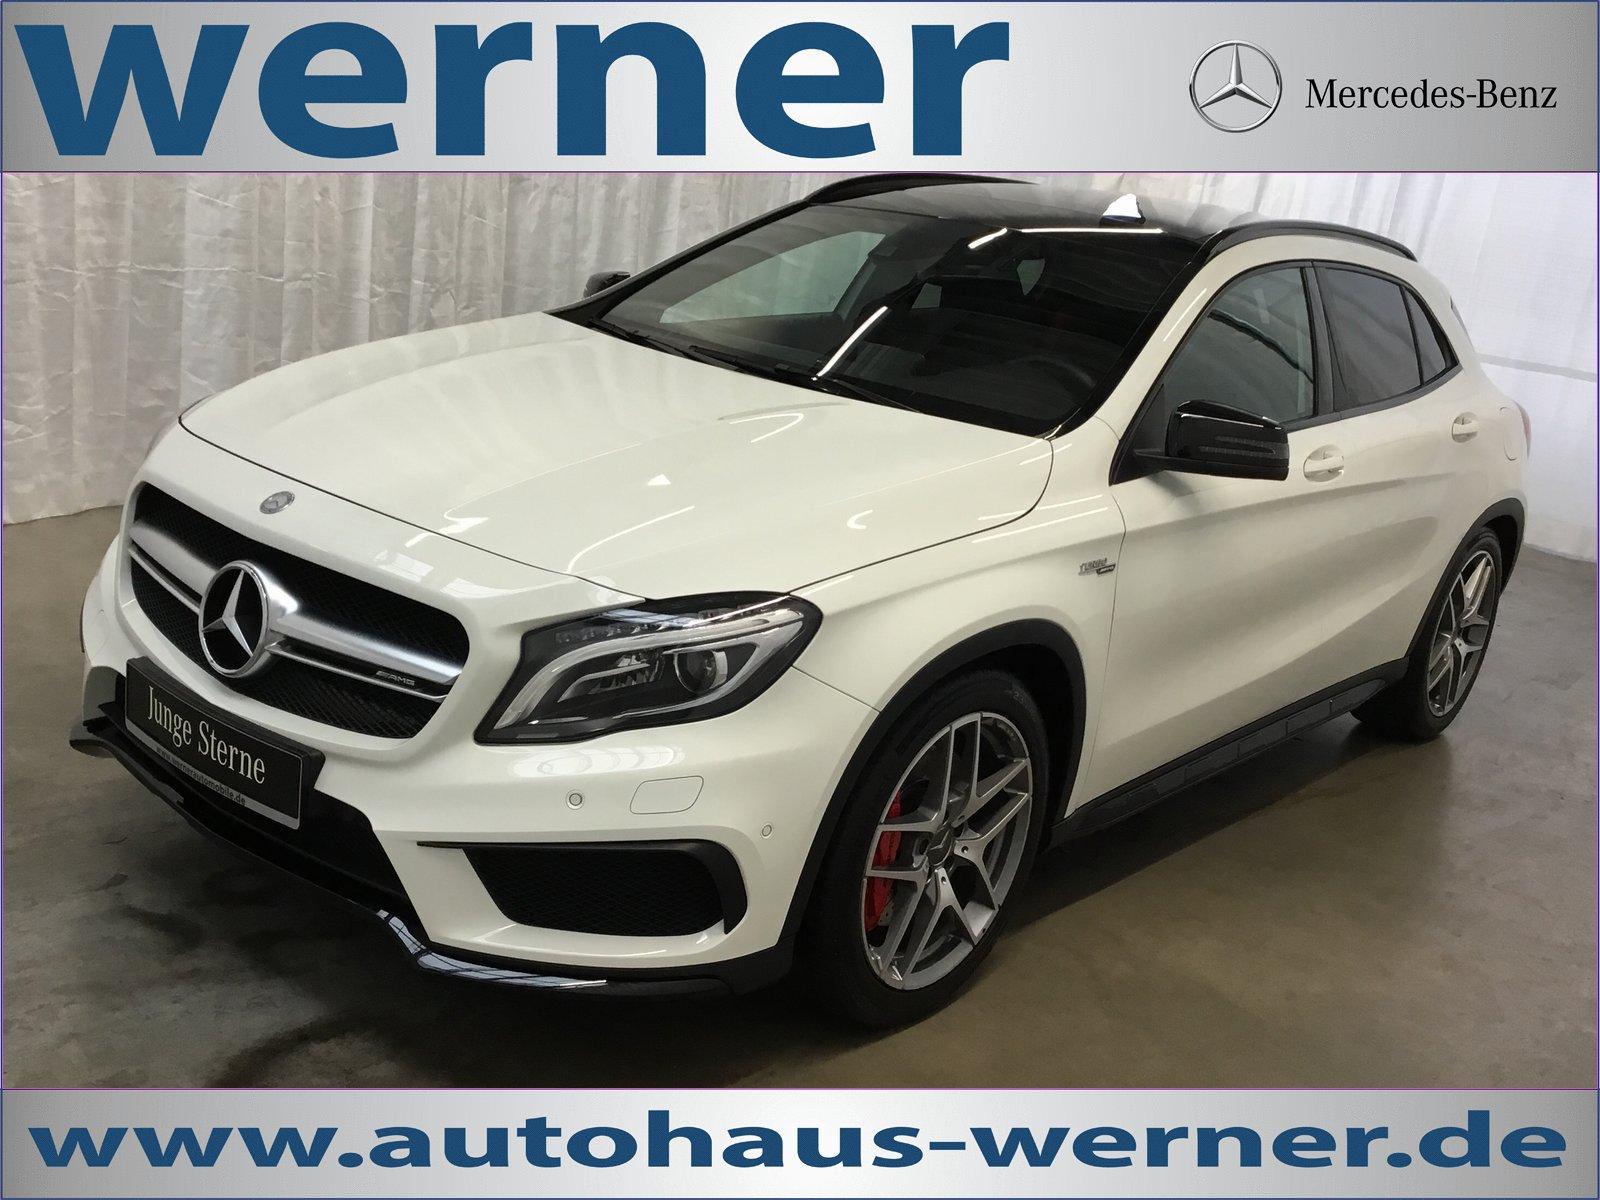 Mercedes-Benz GLA 45 AMG 4M Night Pano Comand Perfor-Abgas ILS, Jahr 2015, petrol